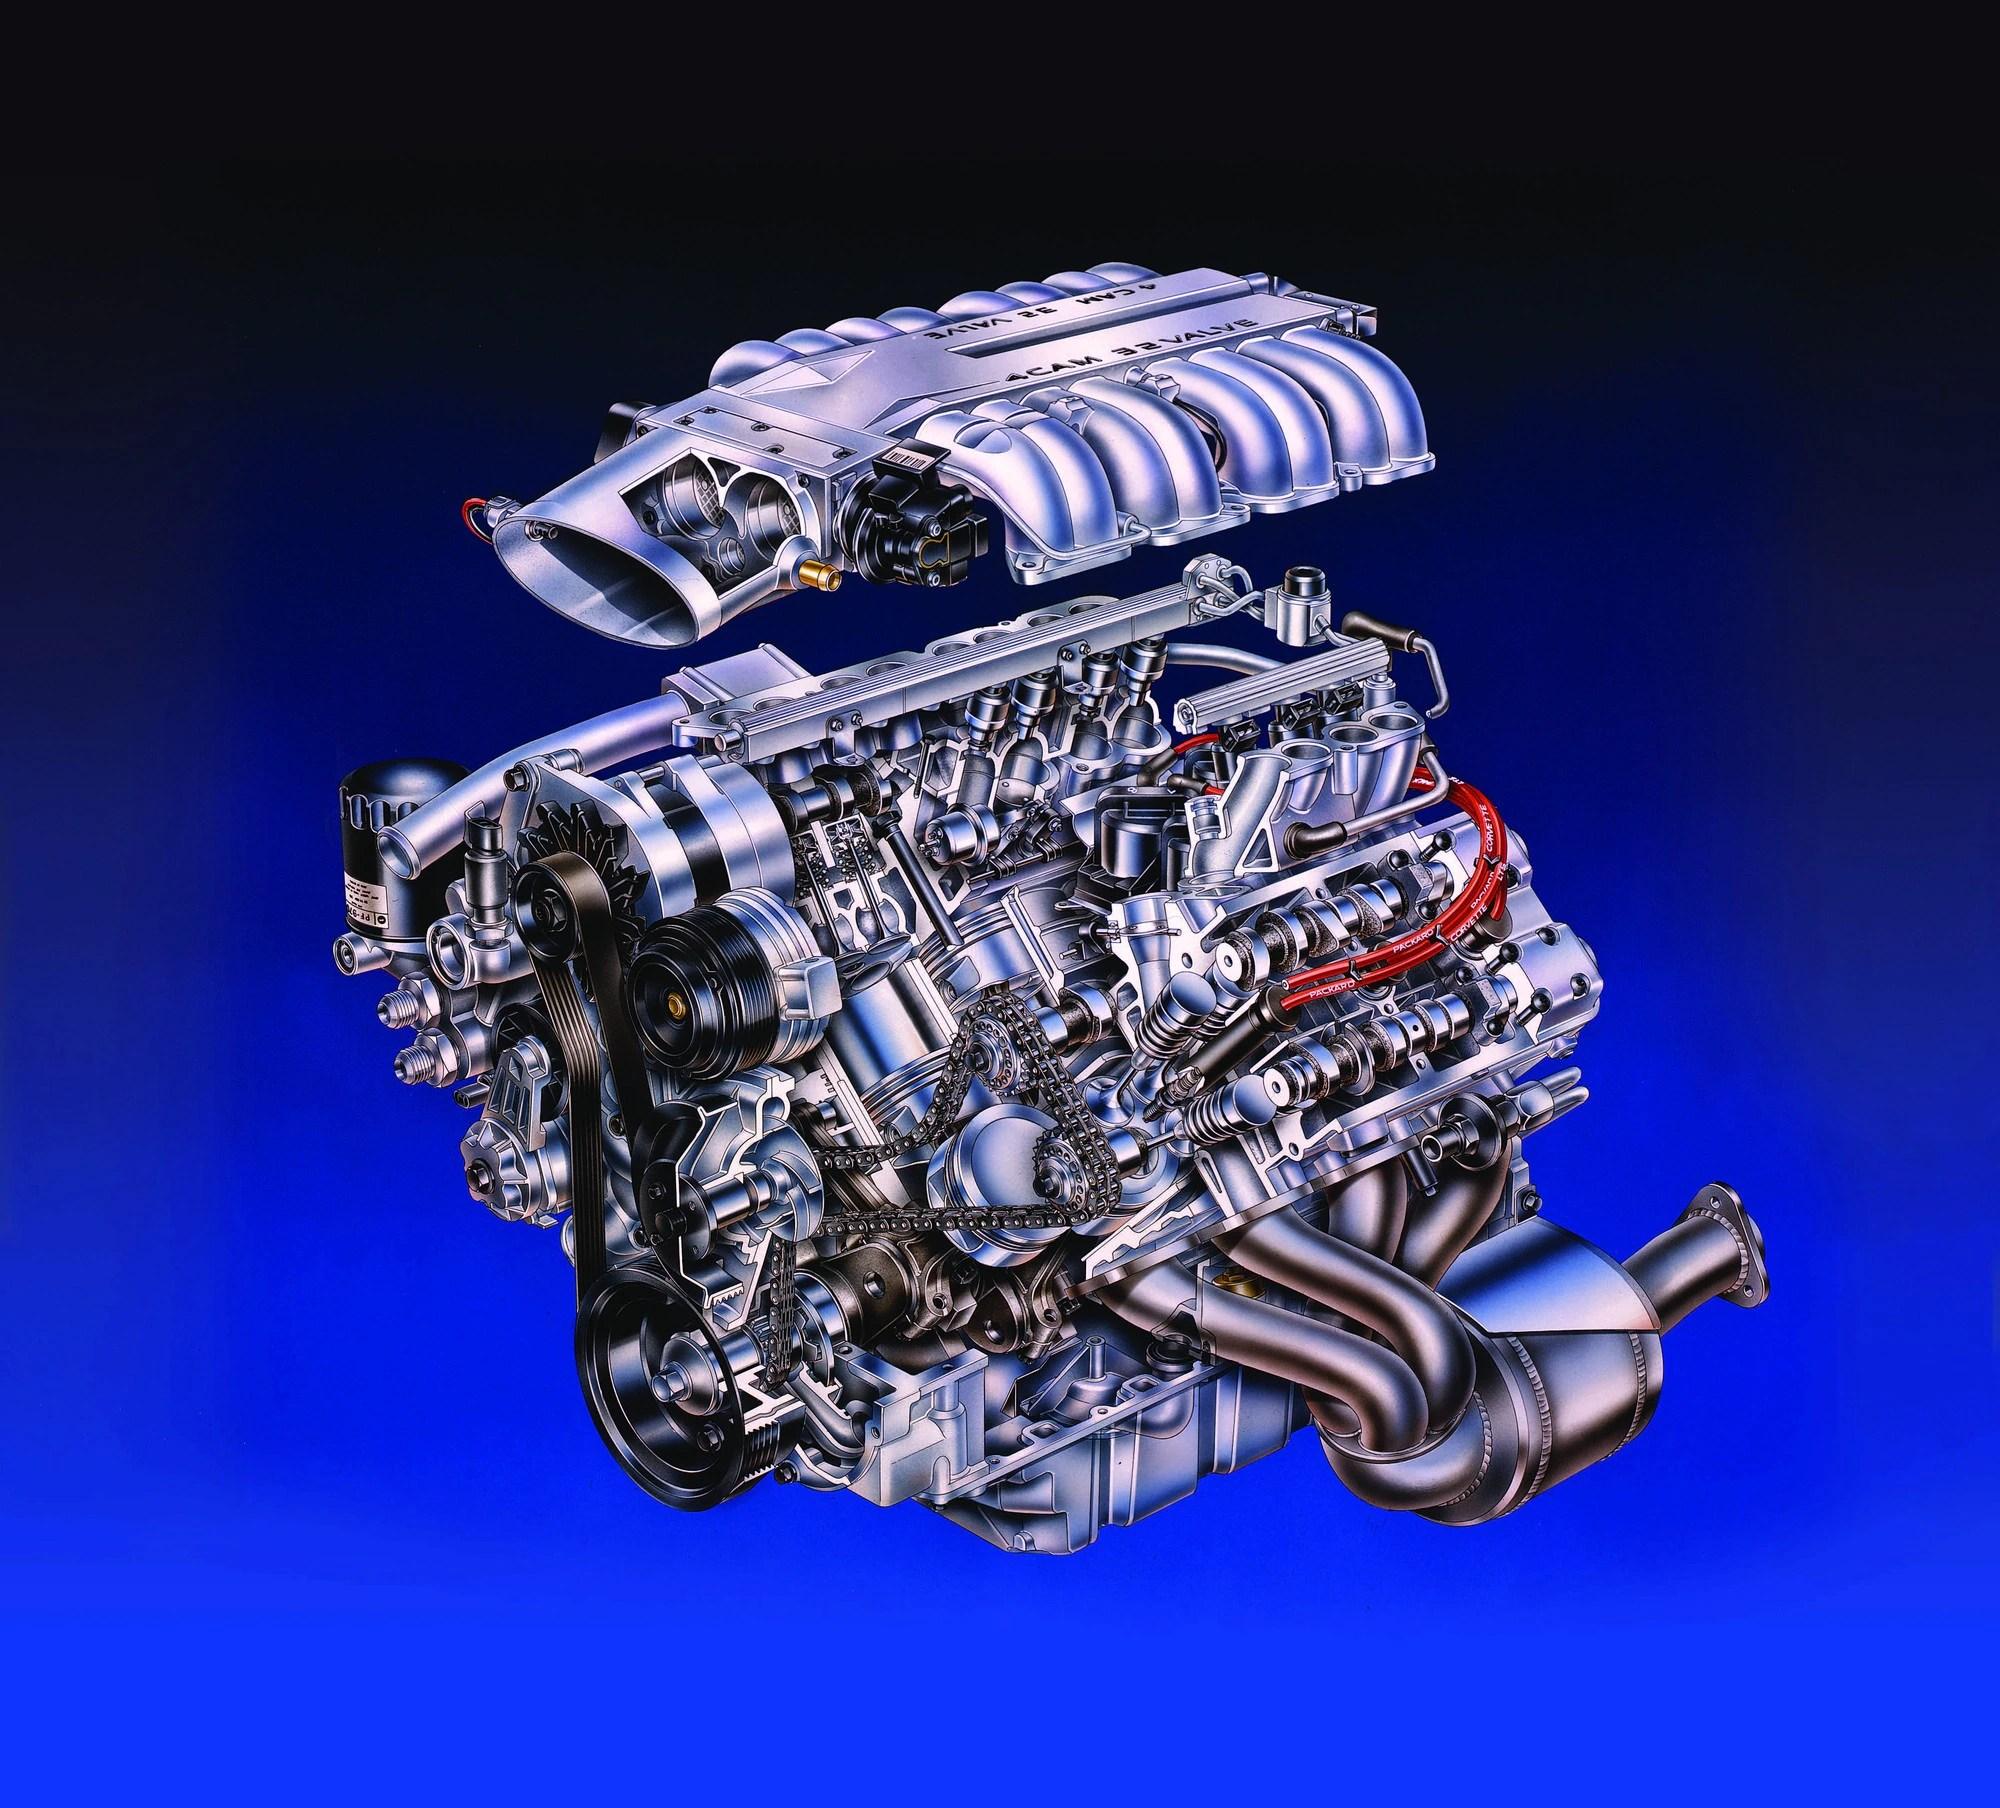 1981 corvette engine diagram wiring library rh 2 embracingprevention org zr1 lt5 engine lt4 engine [ 2000 x 1808 Pixel ]